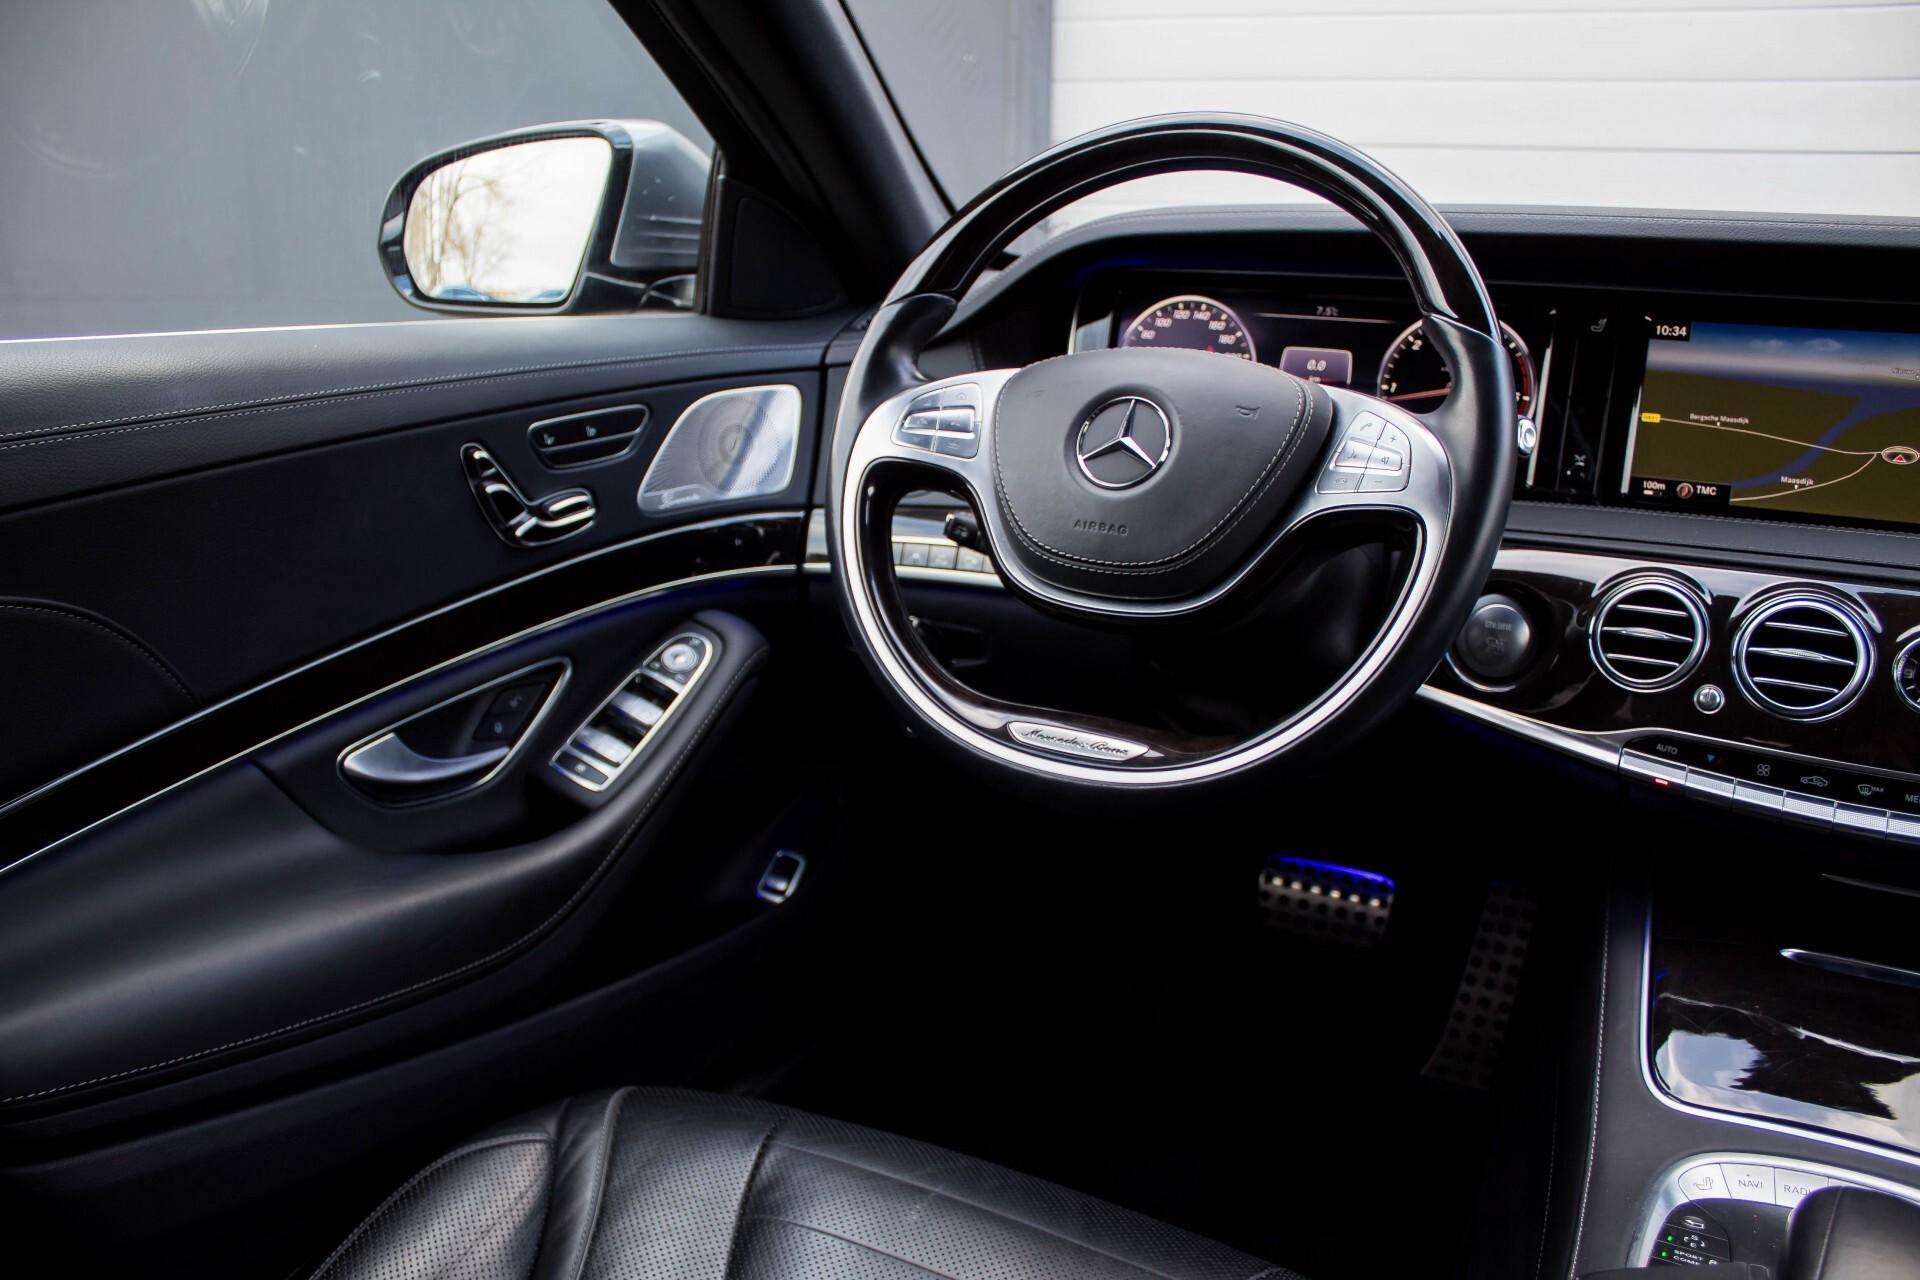 Mercedes-Benz S-Klasse 350 BlueTEC 63 AMG Panorama/Distronic/Keyless/Massage/Burmester Aut7 Foto 7